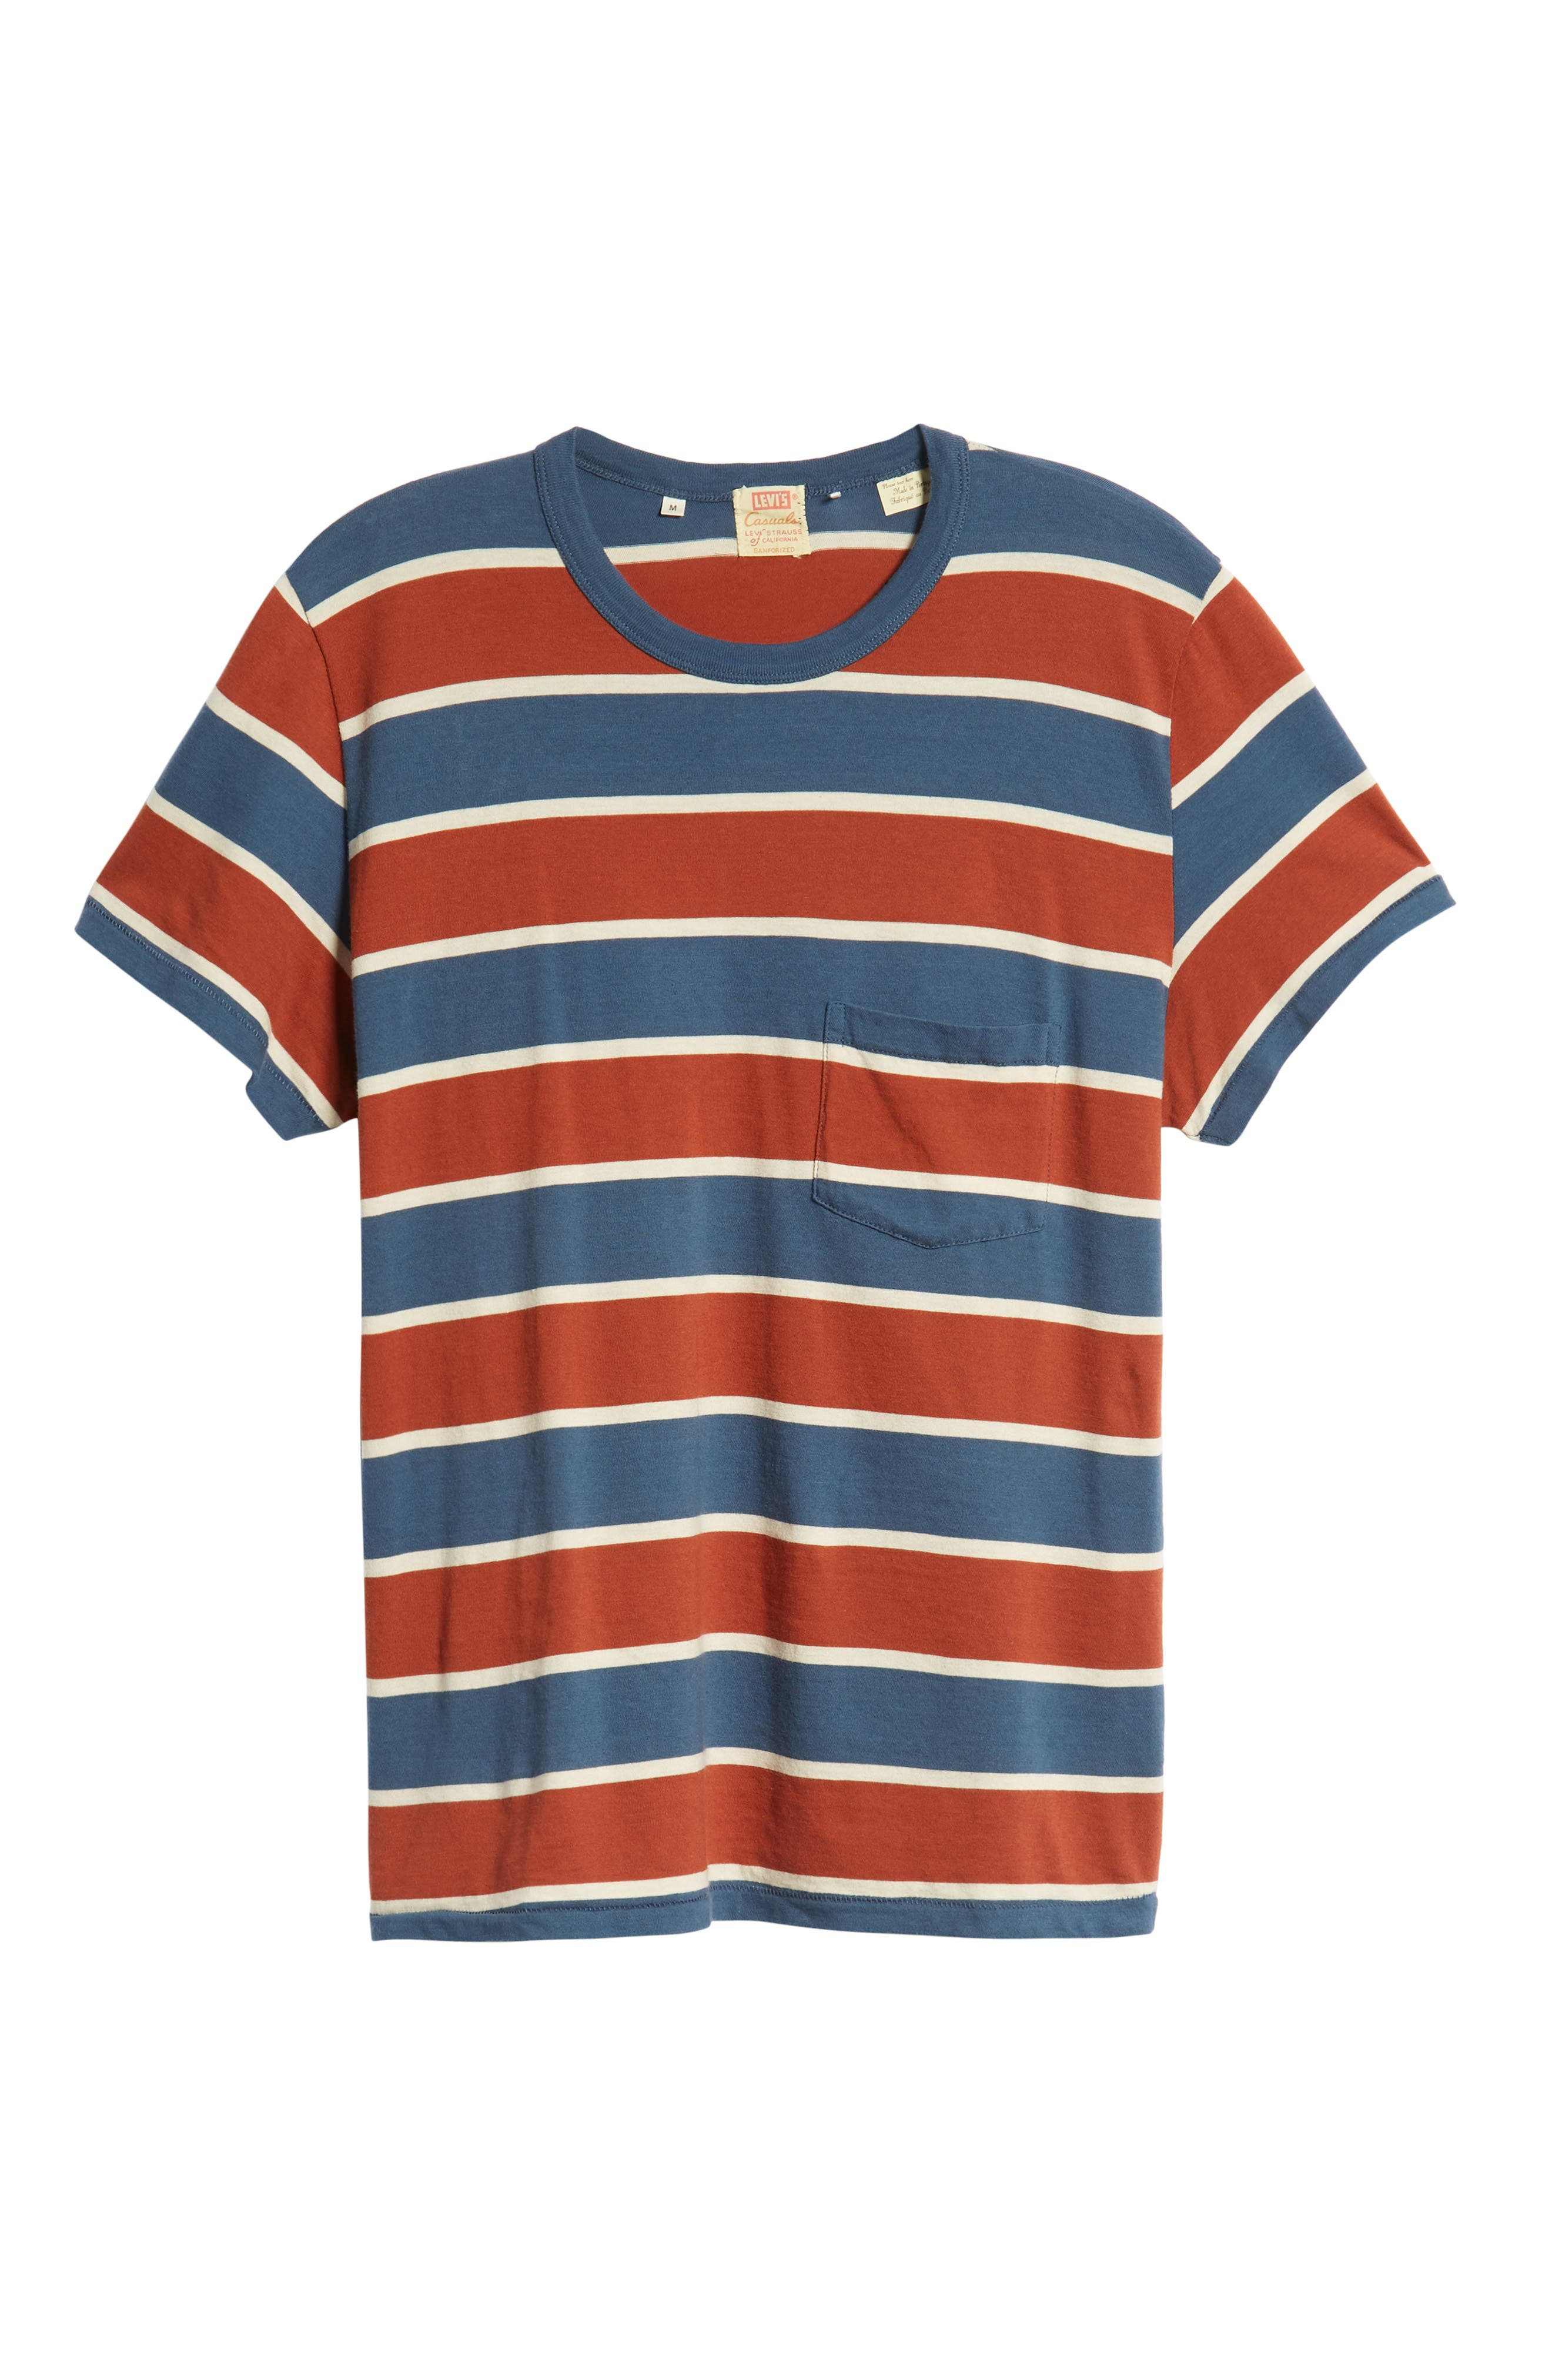 1960s Slim Fit Stripe T-Shirt,                             Alternate thumbnail 6, color,                             DARK DENIM MULTI STRIPE